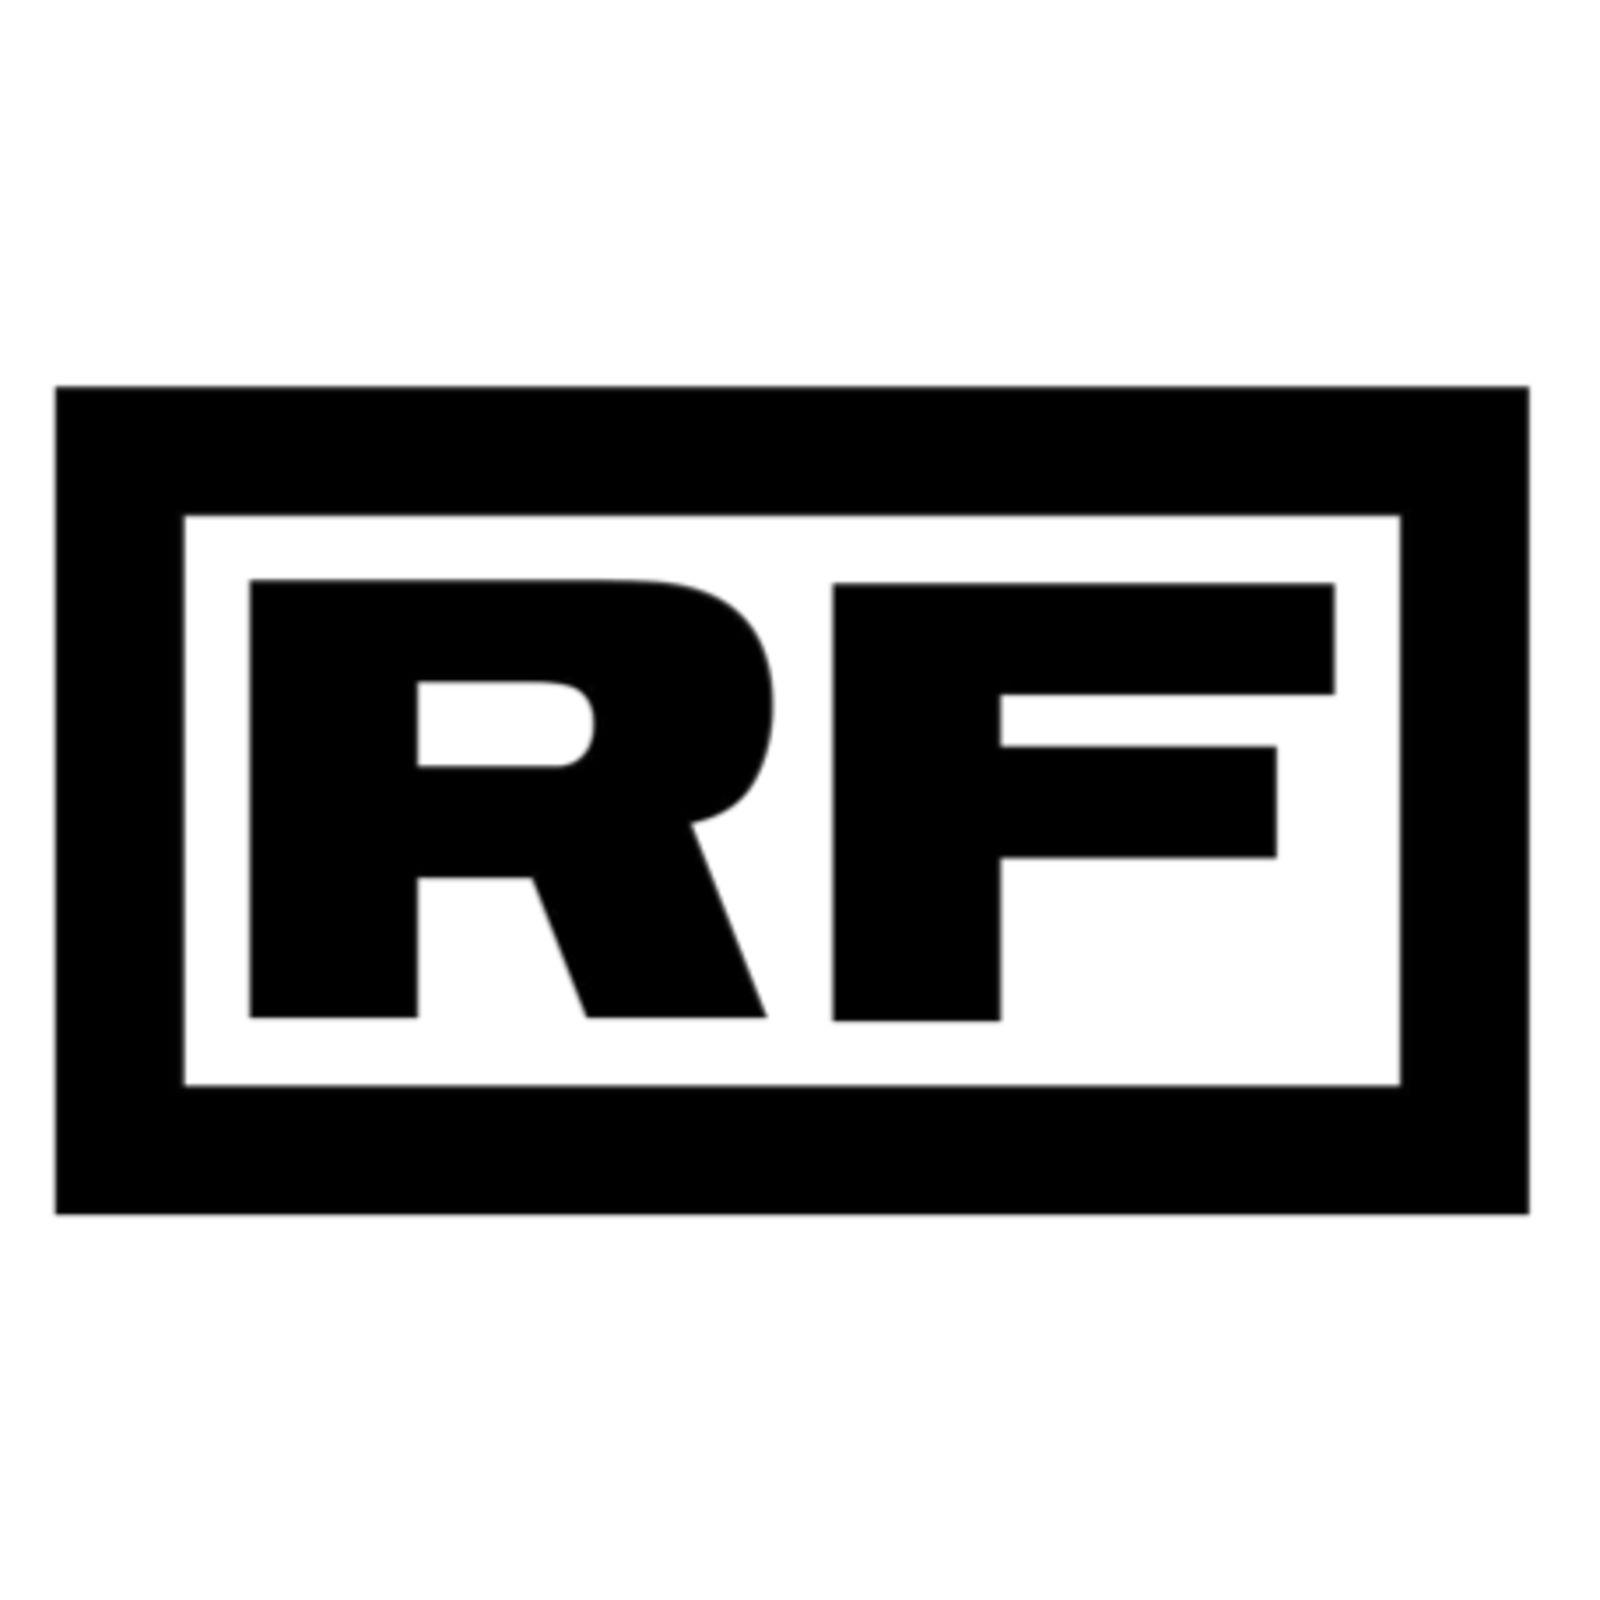 RF ROXANNE FARAHMAND